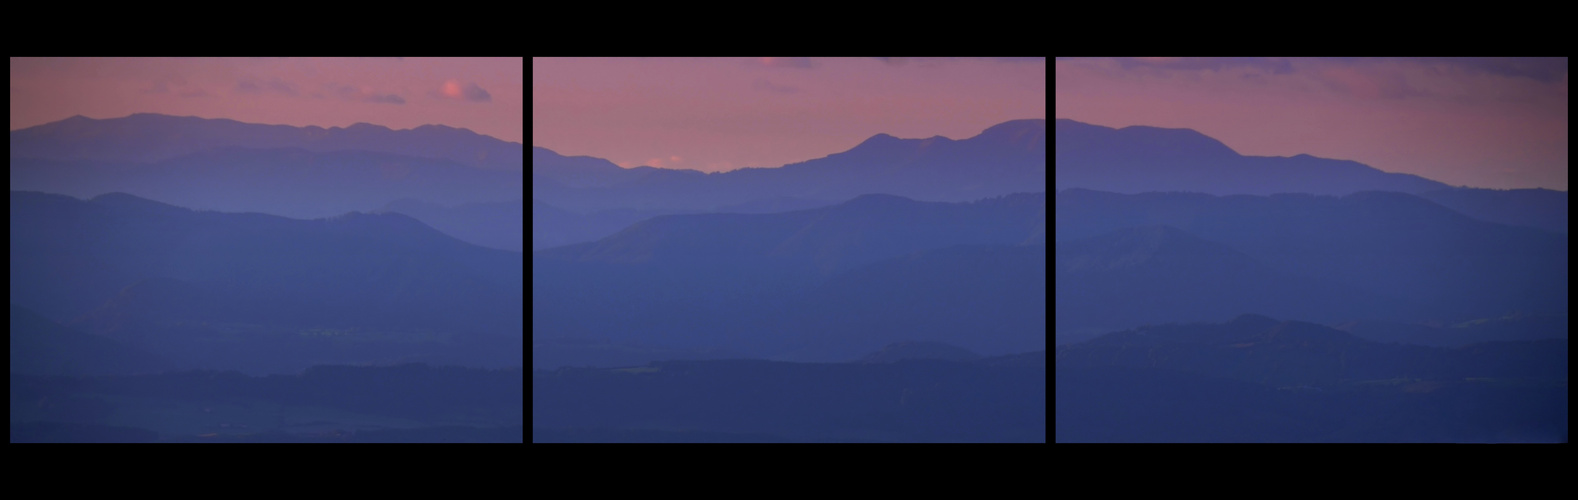 blue mountains triptychon